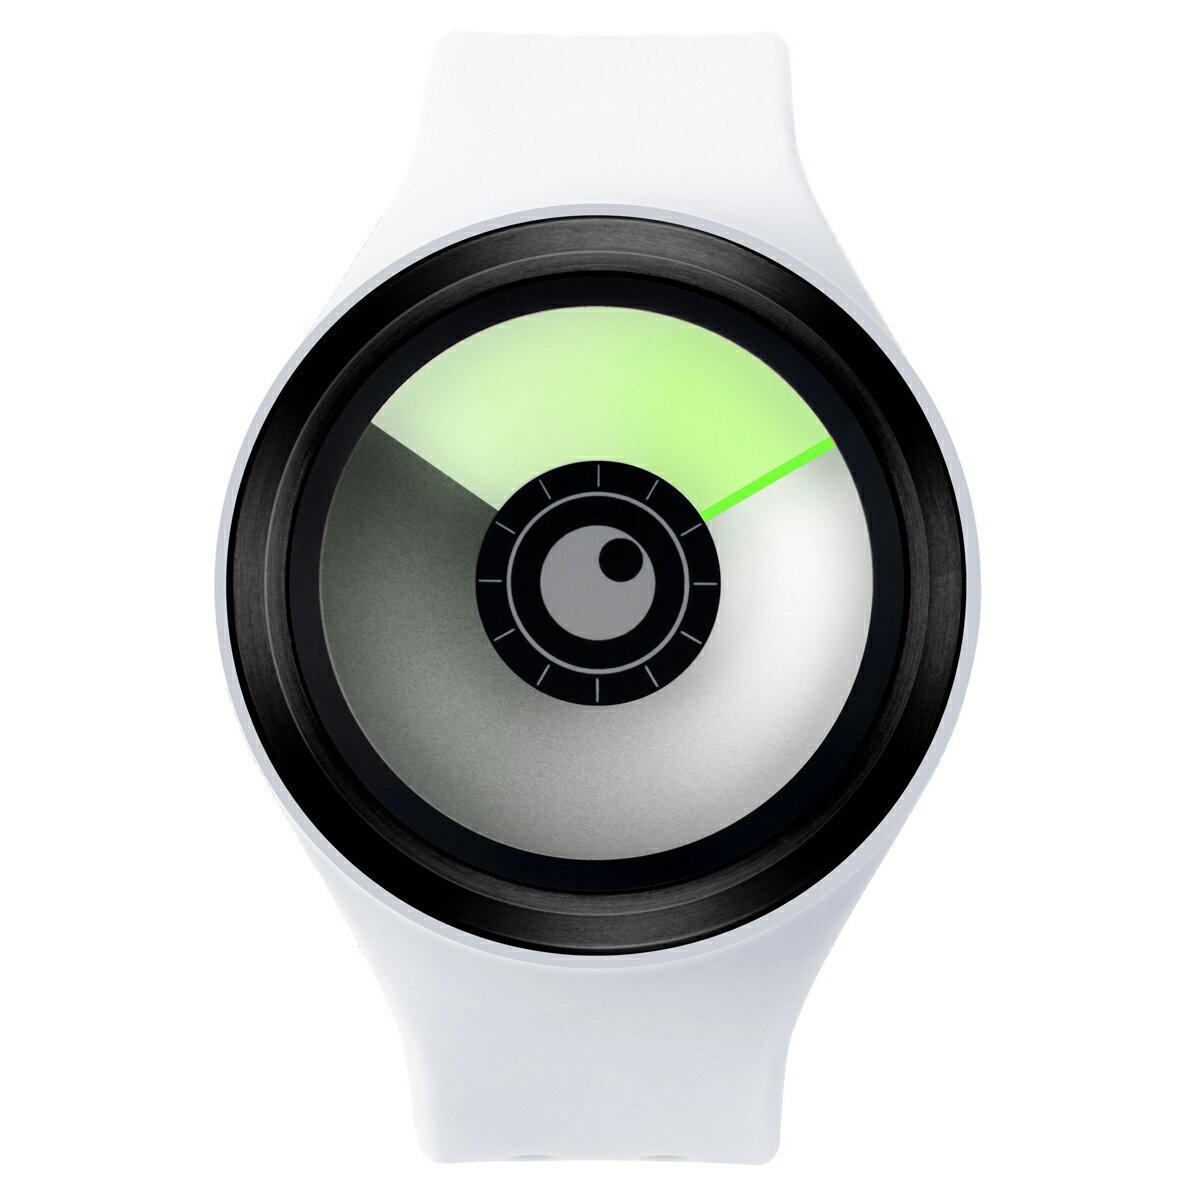 ZEROO AURORA BOREALIS ゼロ 電池式クォーツ 腕時計 [W00703B03SR01] ホワイト デザインウォッチ ペア用 メンズ レディース ユニセックス おしゃれ時計 デザイナーズ